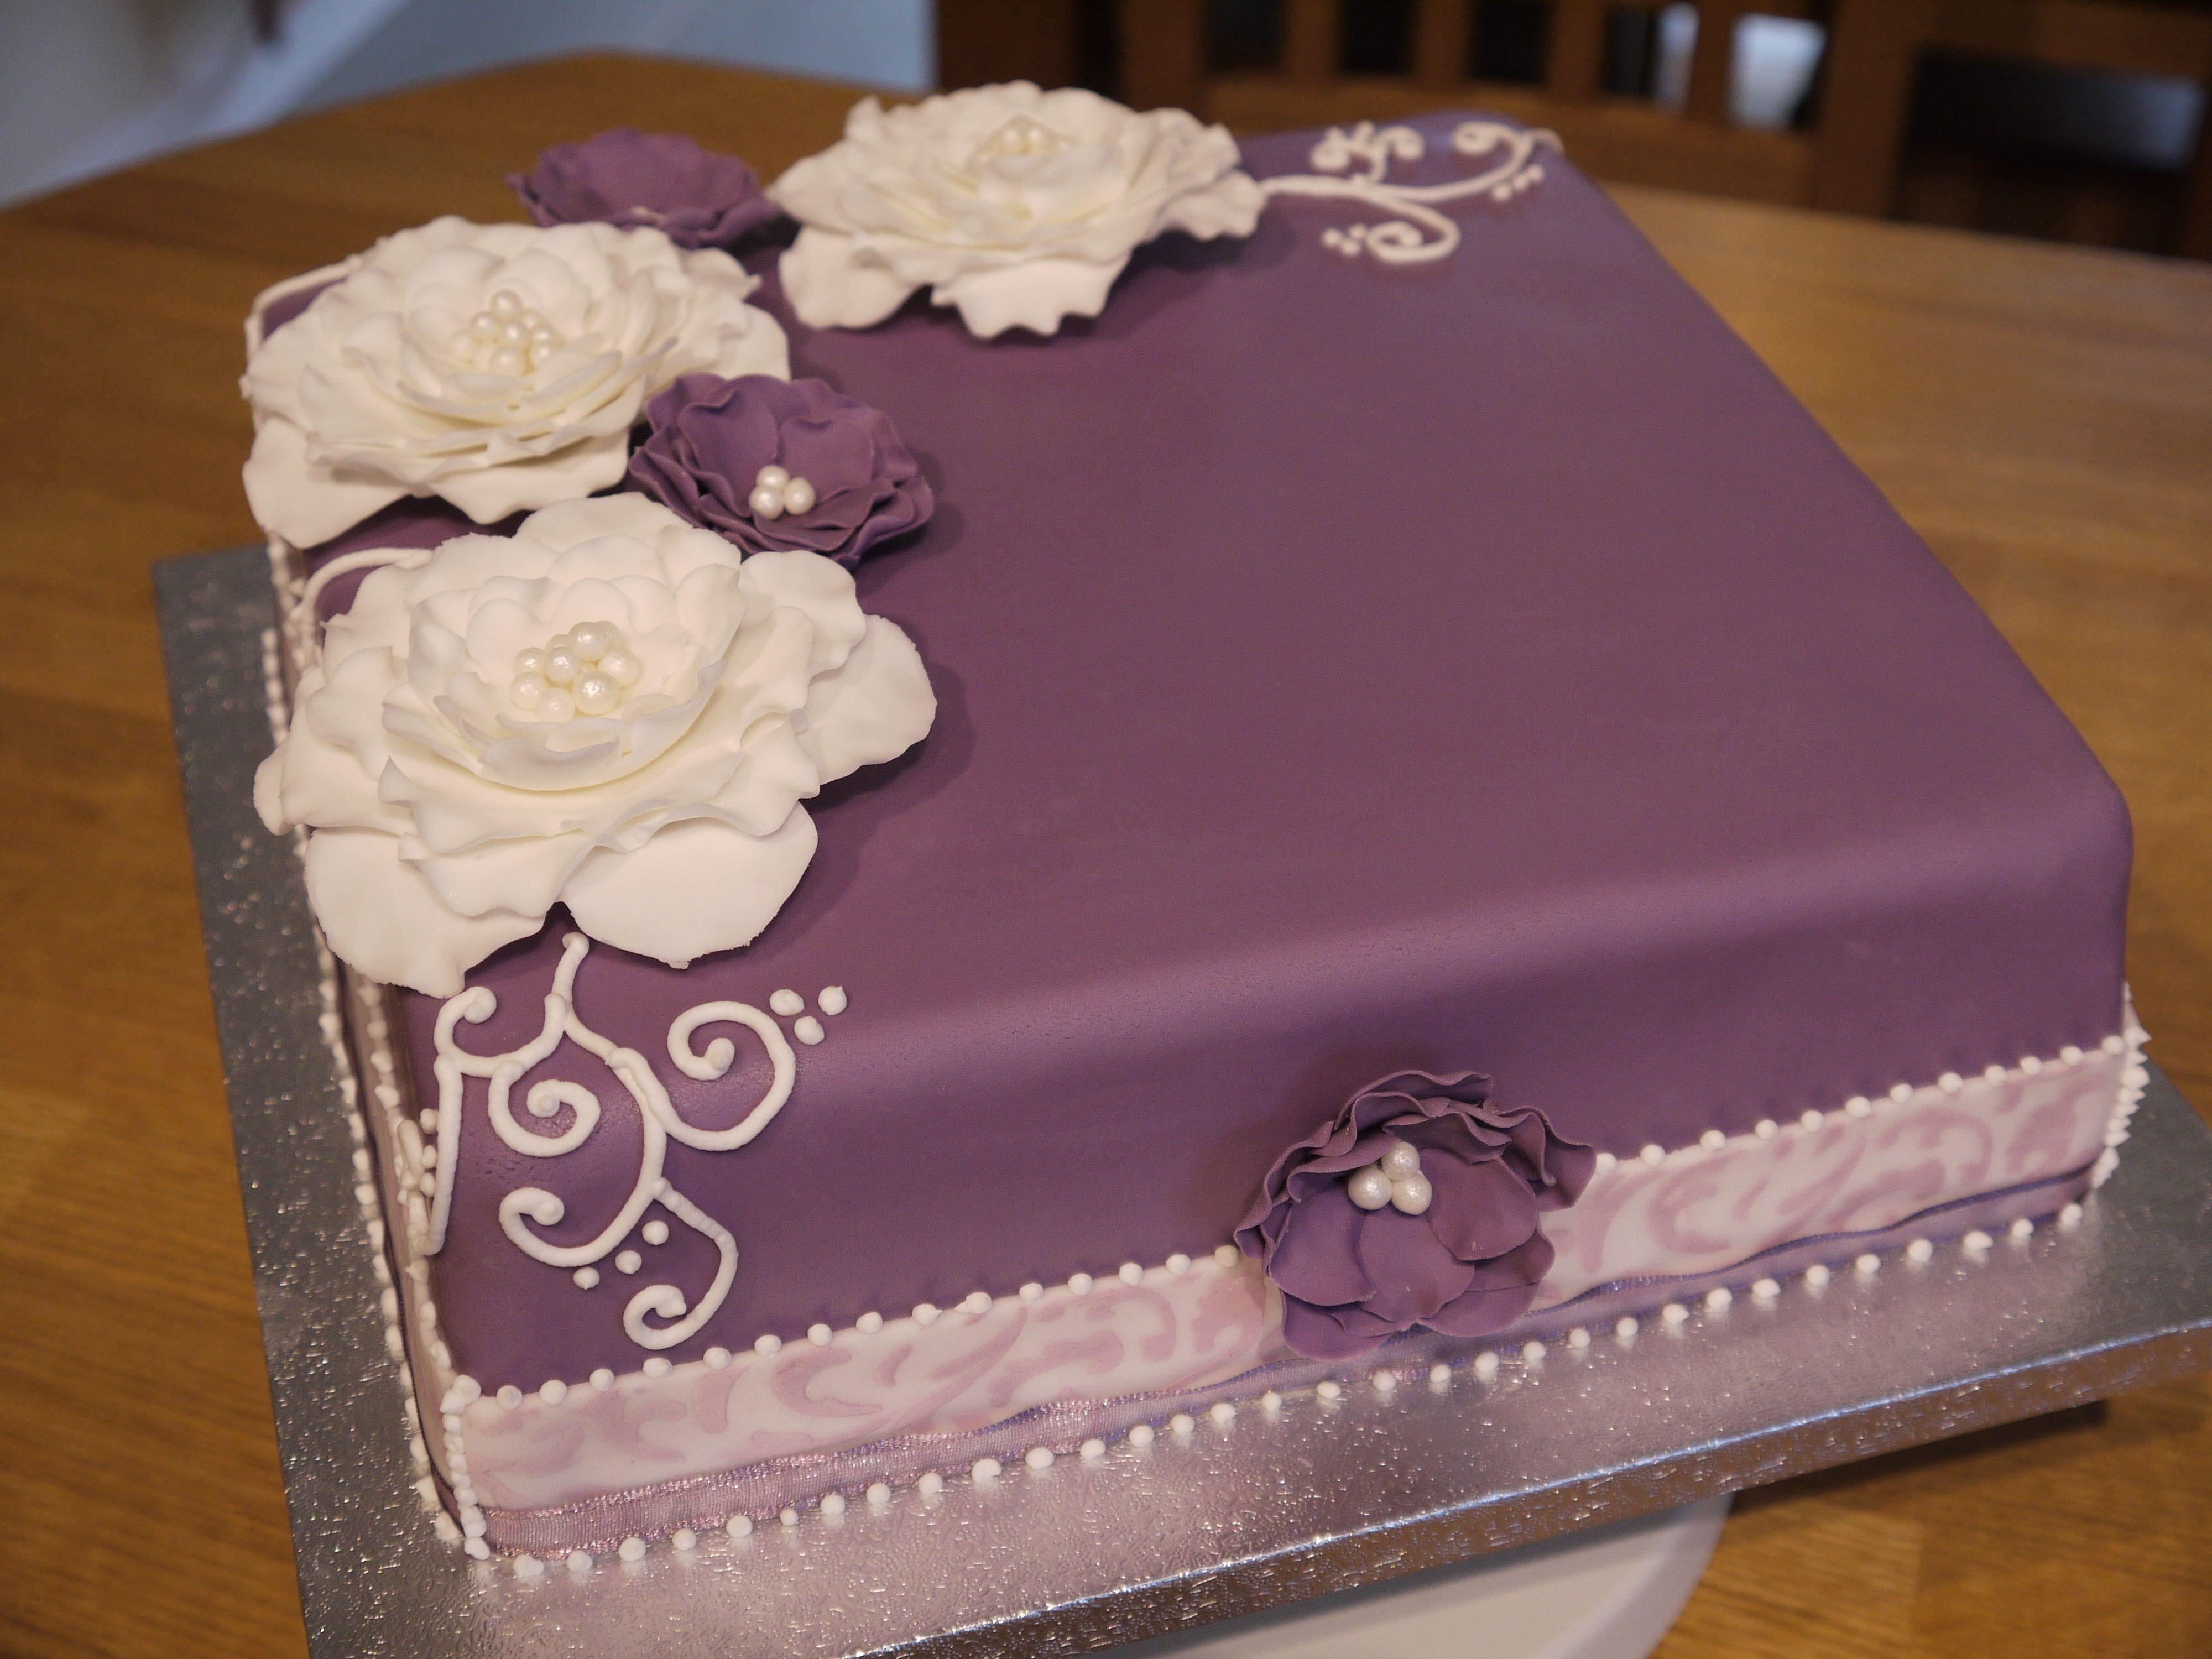 best 25+ purple birthday cakes ideas on pinterest | purple cakes